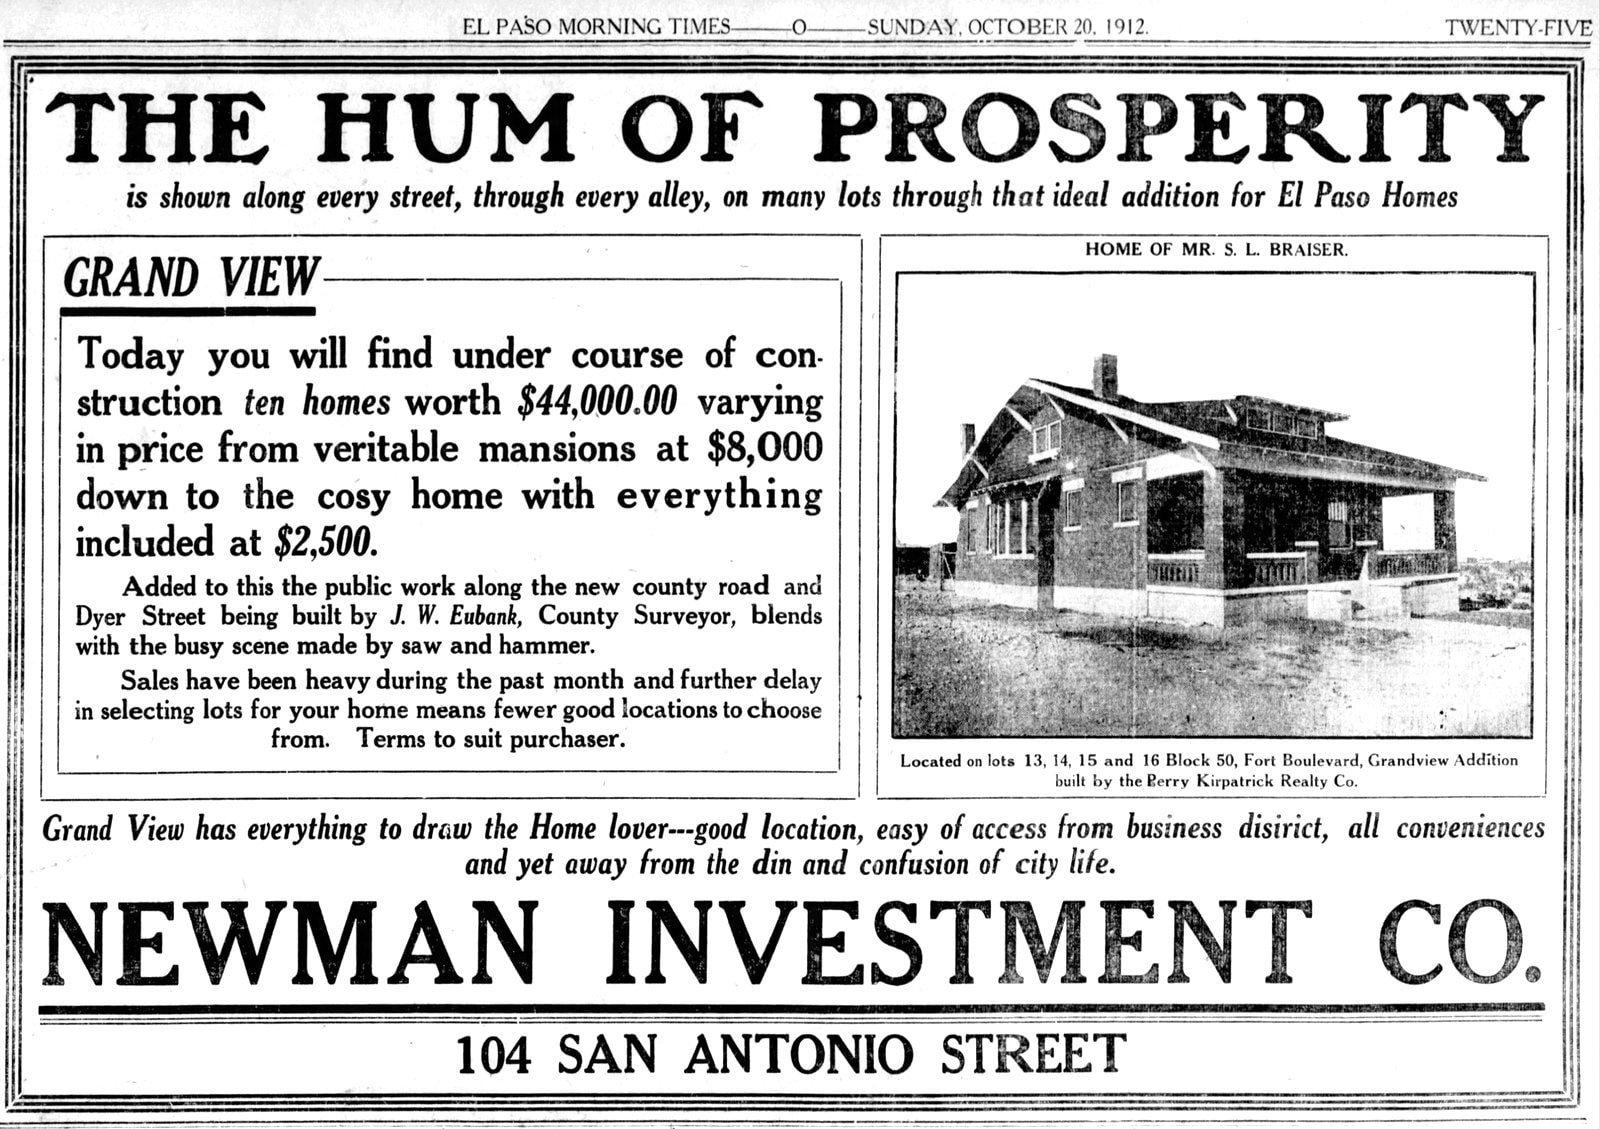 El Paso's Grand View home development - October 20, 1912